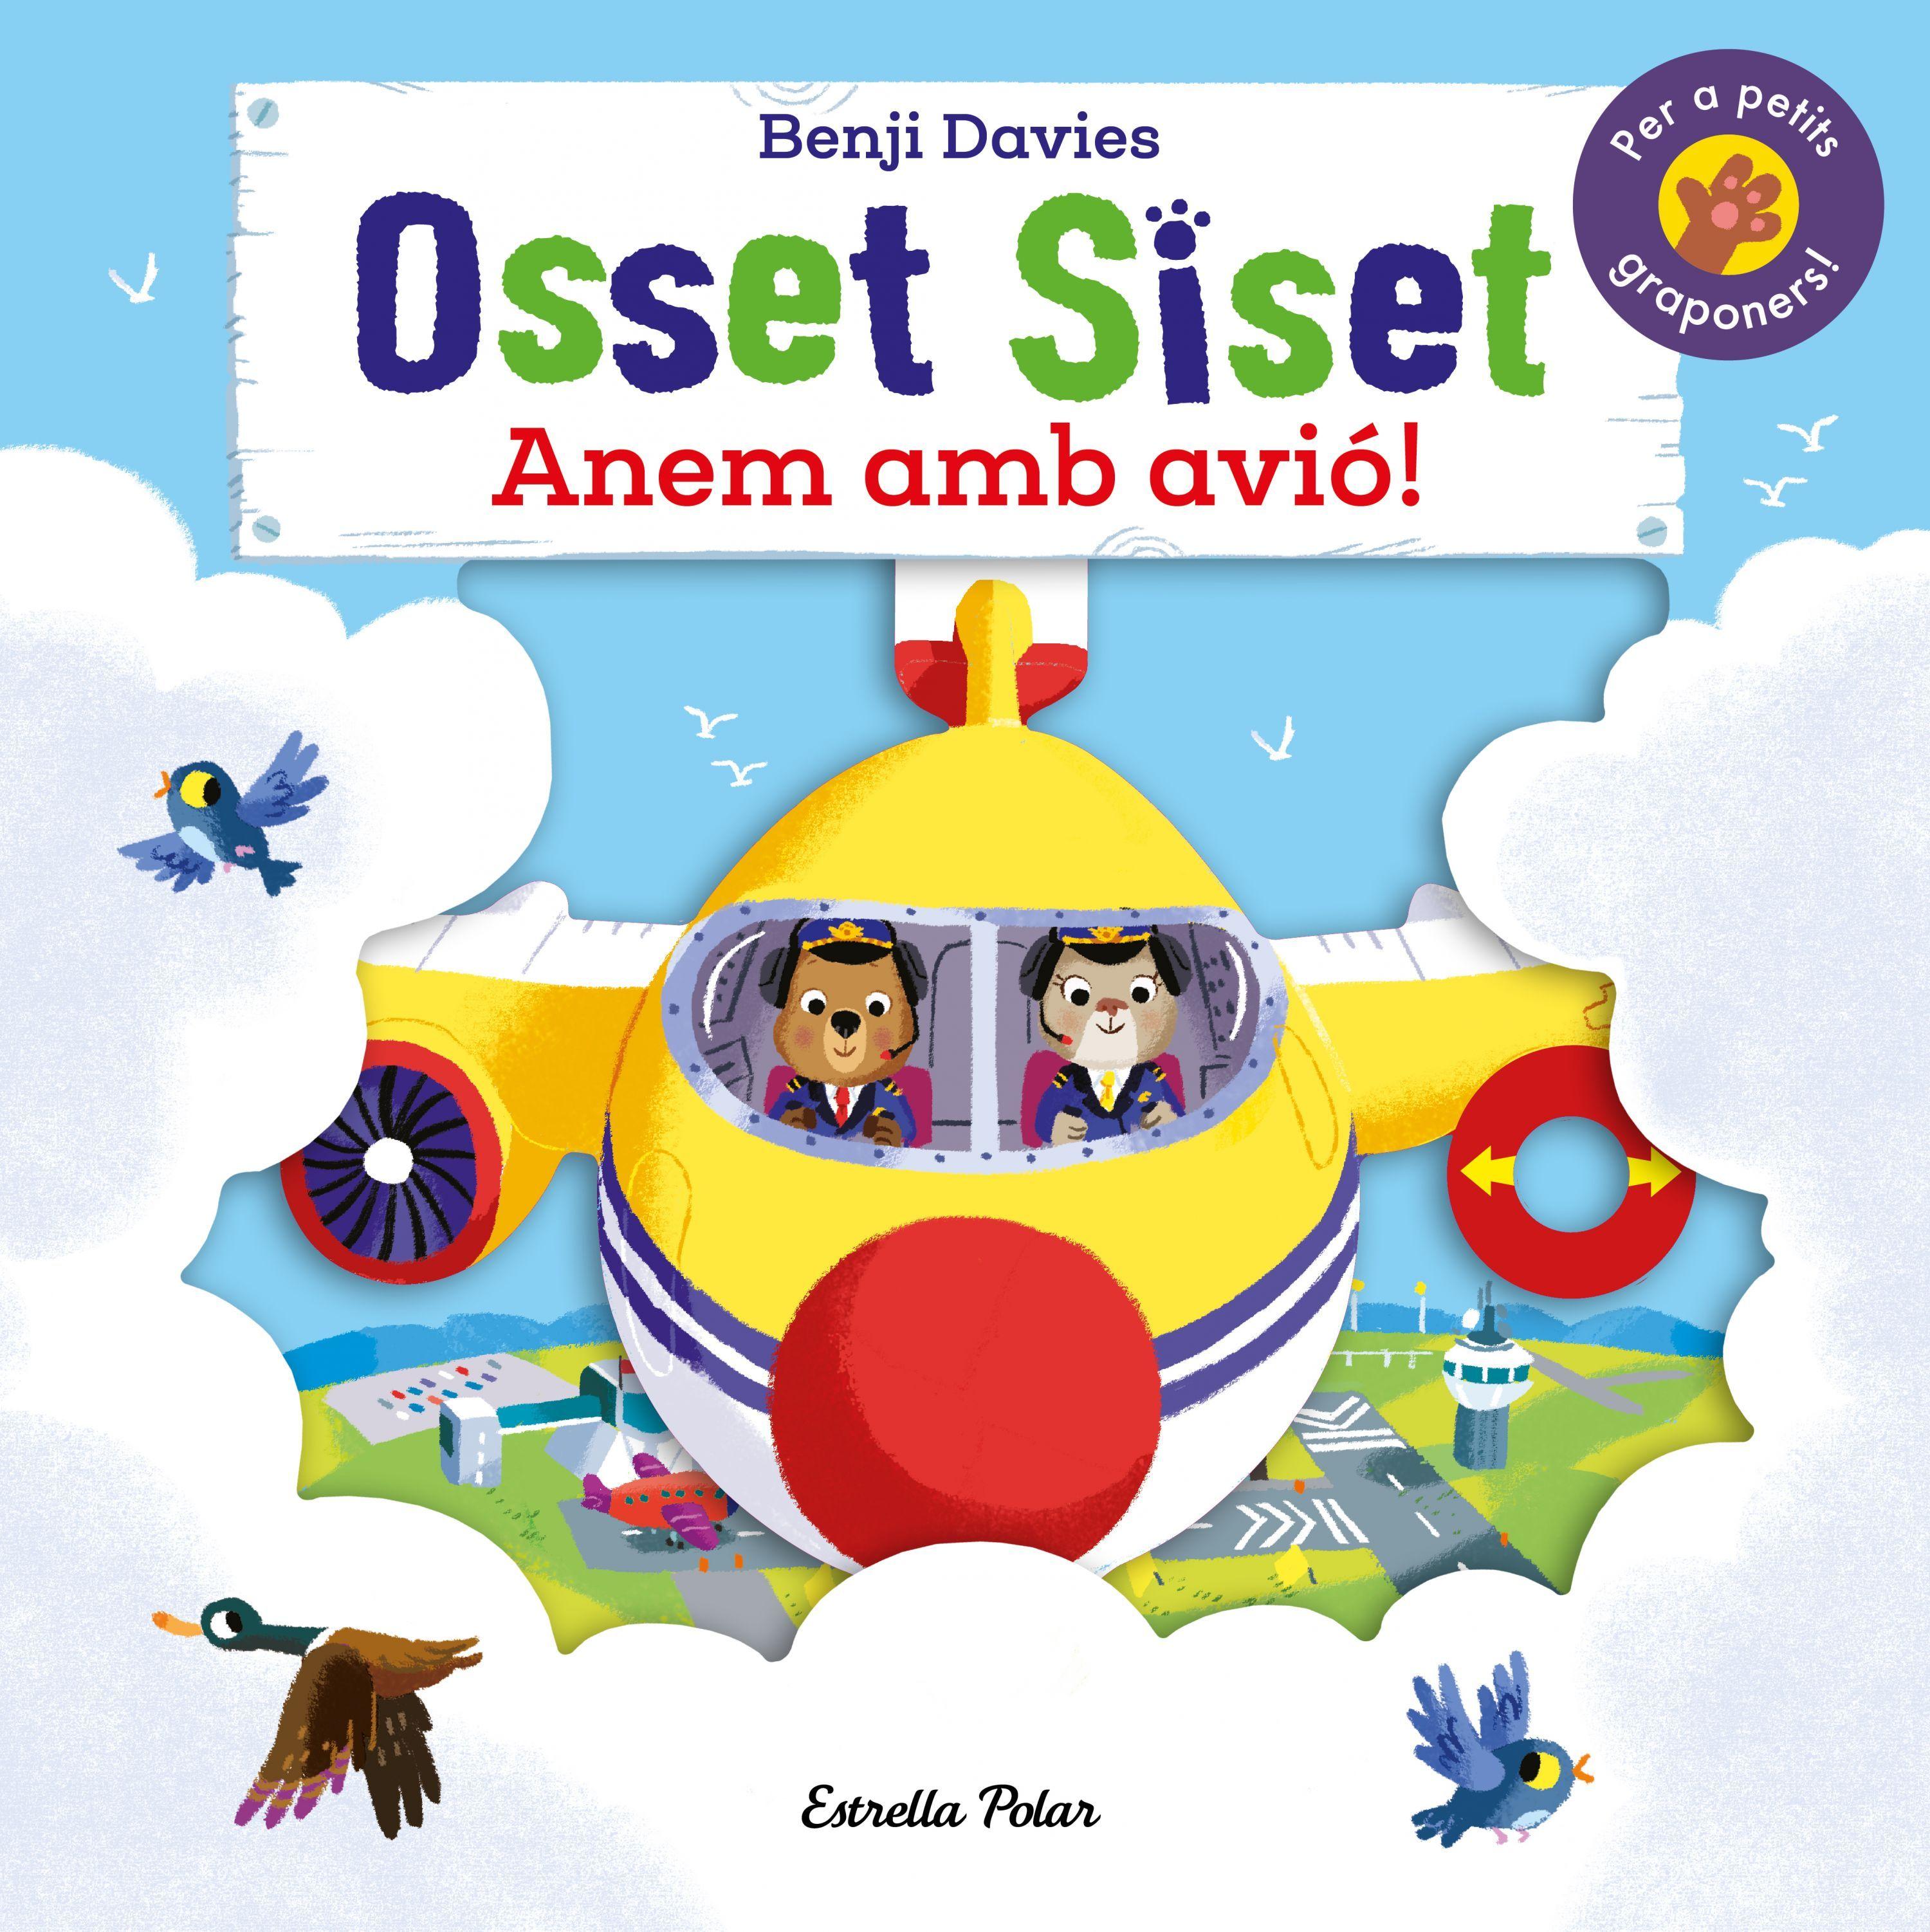 OSSET SISET ANEM AMB AVIO